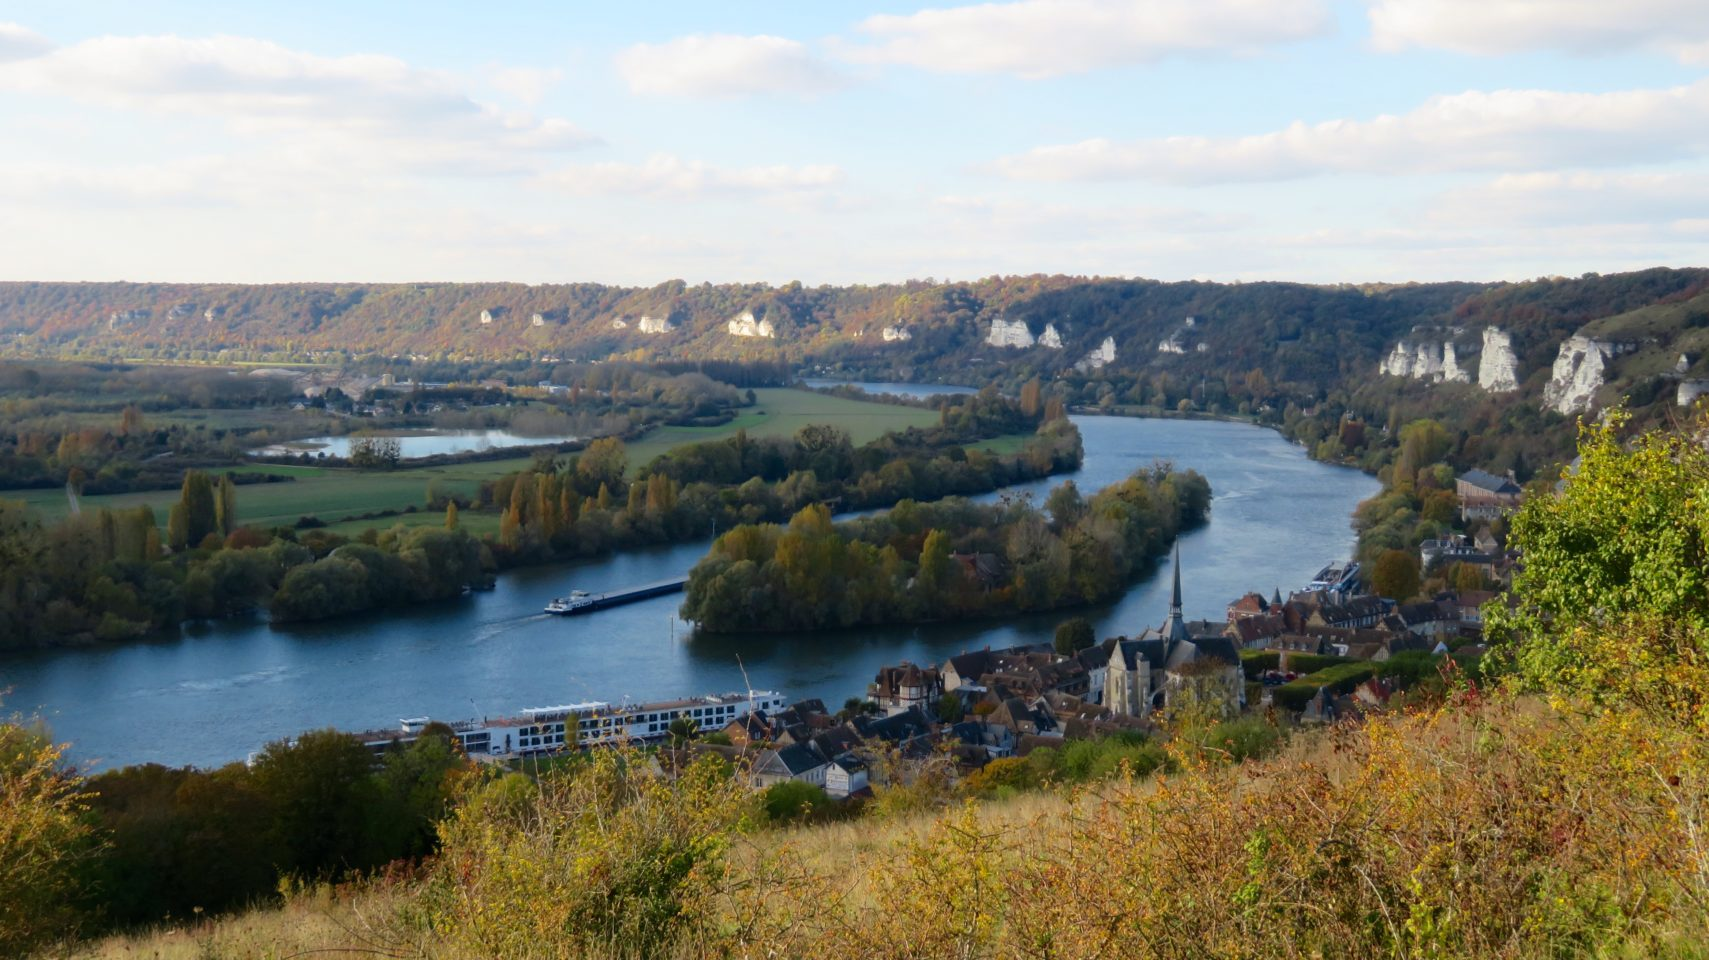 Meandering Seine River at Les Andelys in Normandie, France (Paris and Normandie AMAWaterways Cruise)